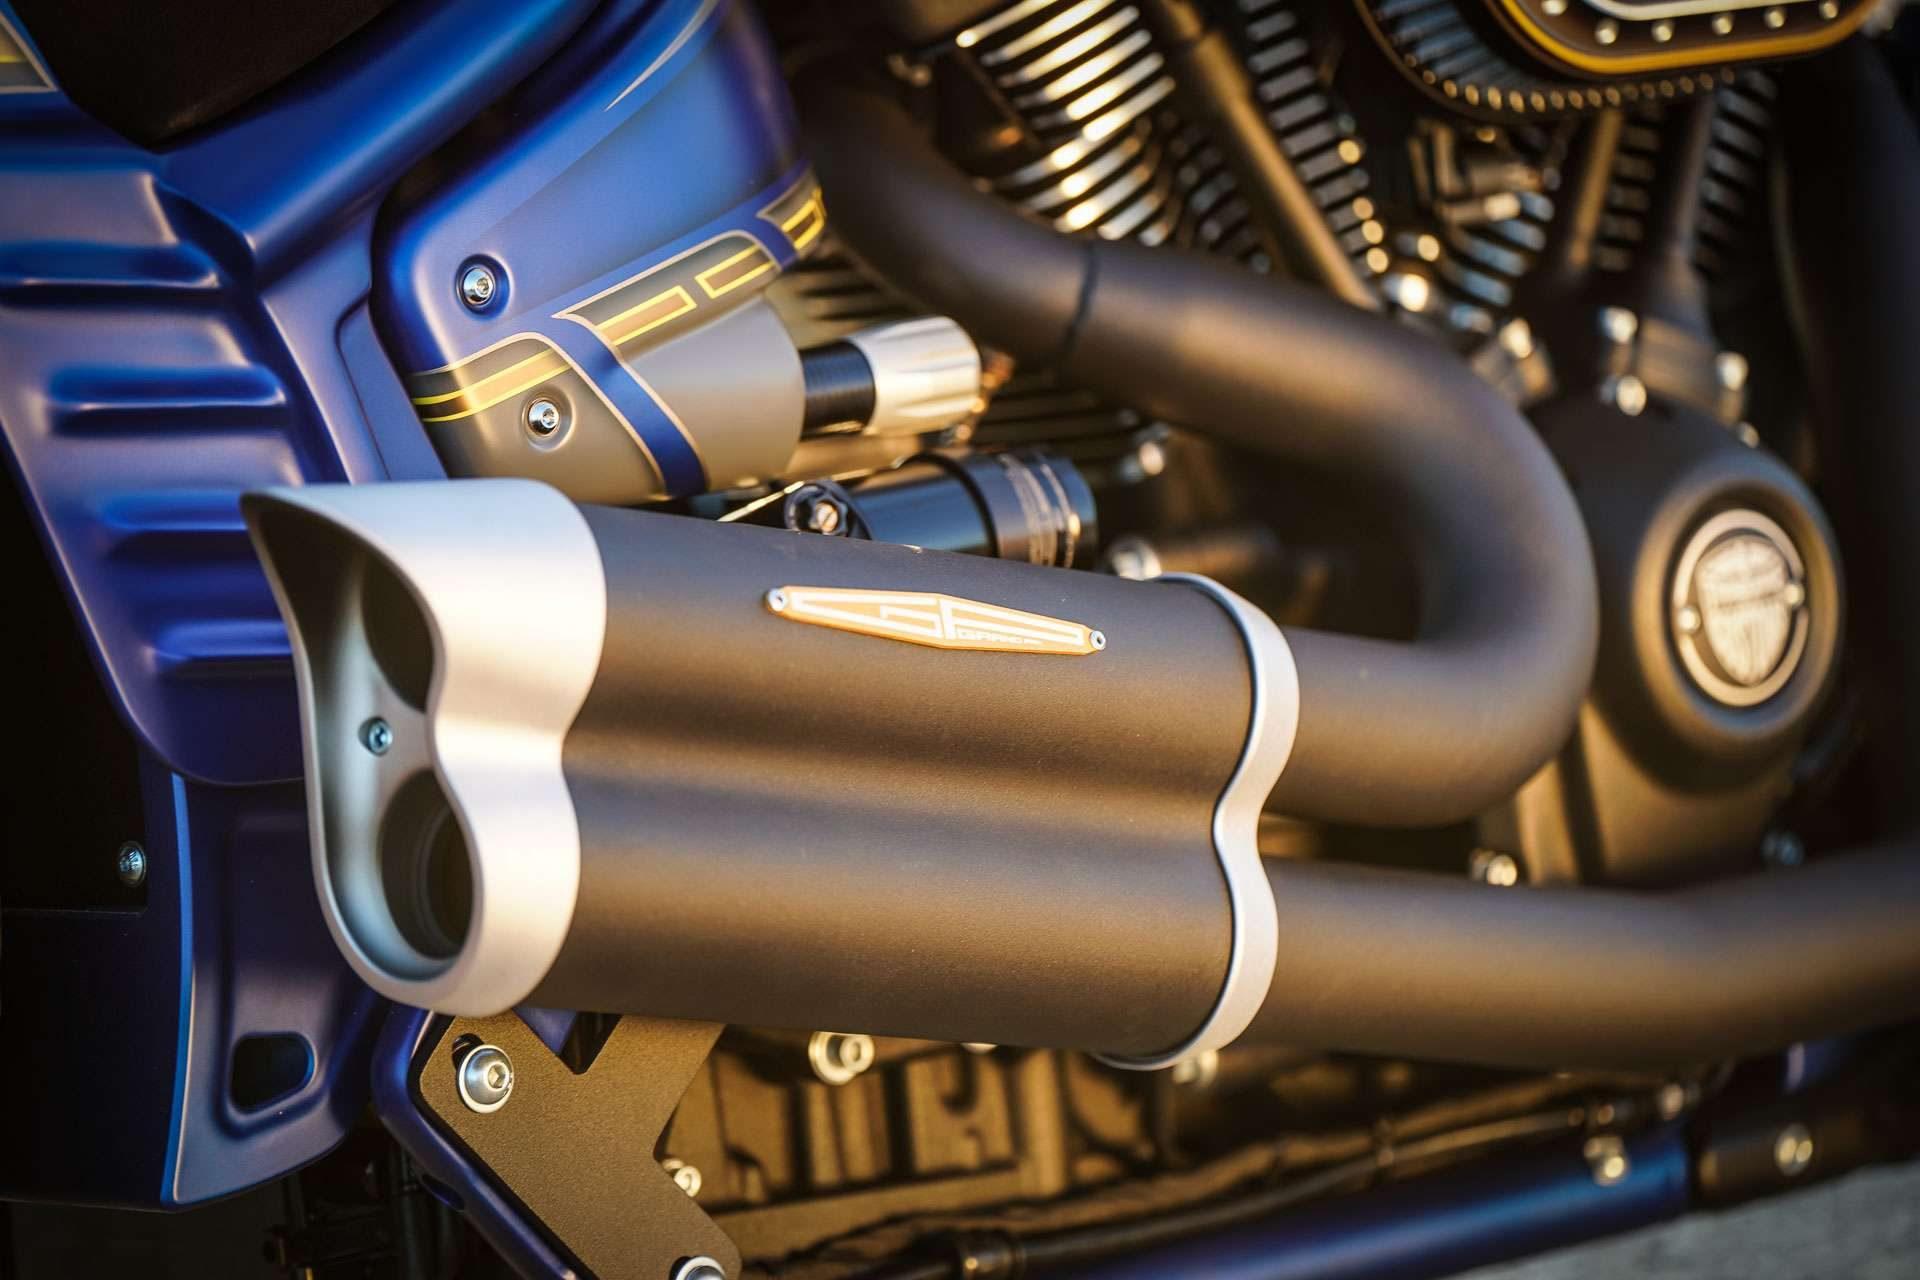 custom m8 breakout parts